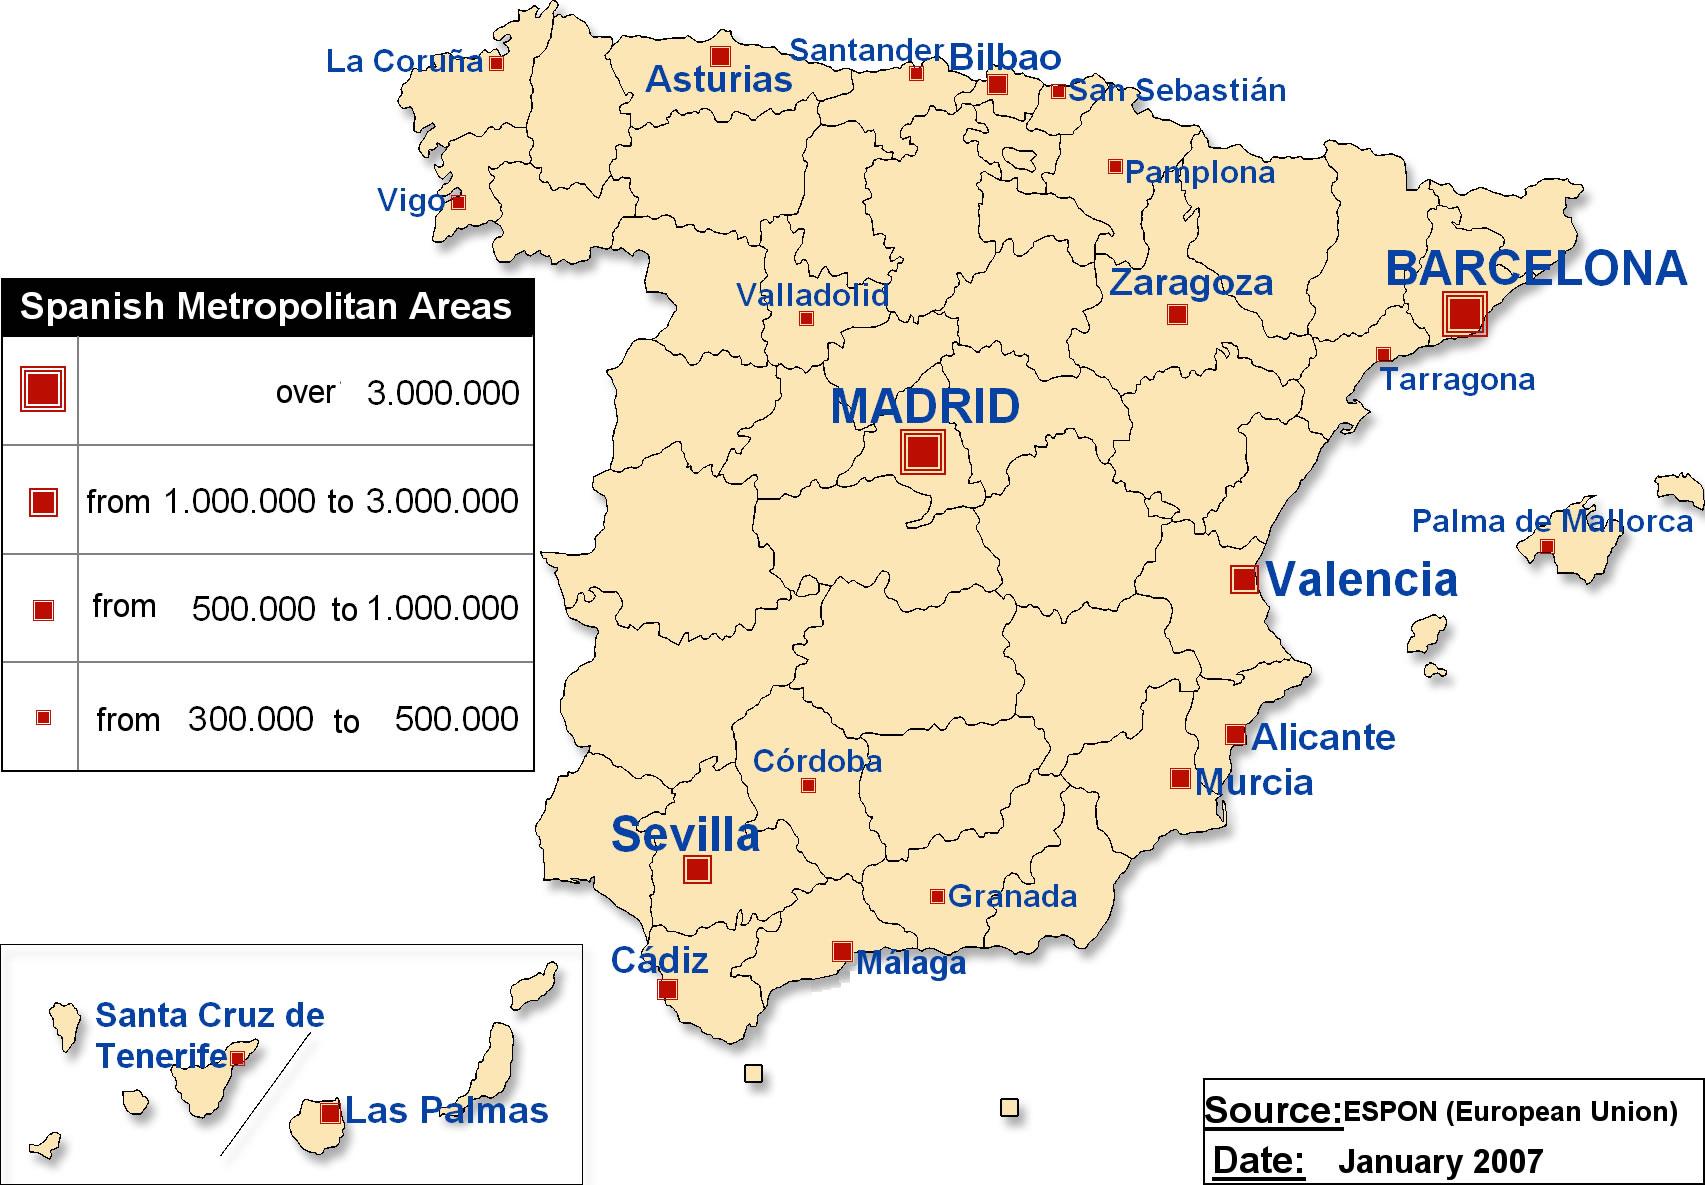 Carte touristique Espagne, Carte touristique de l'Espagne